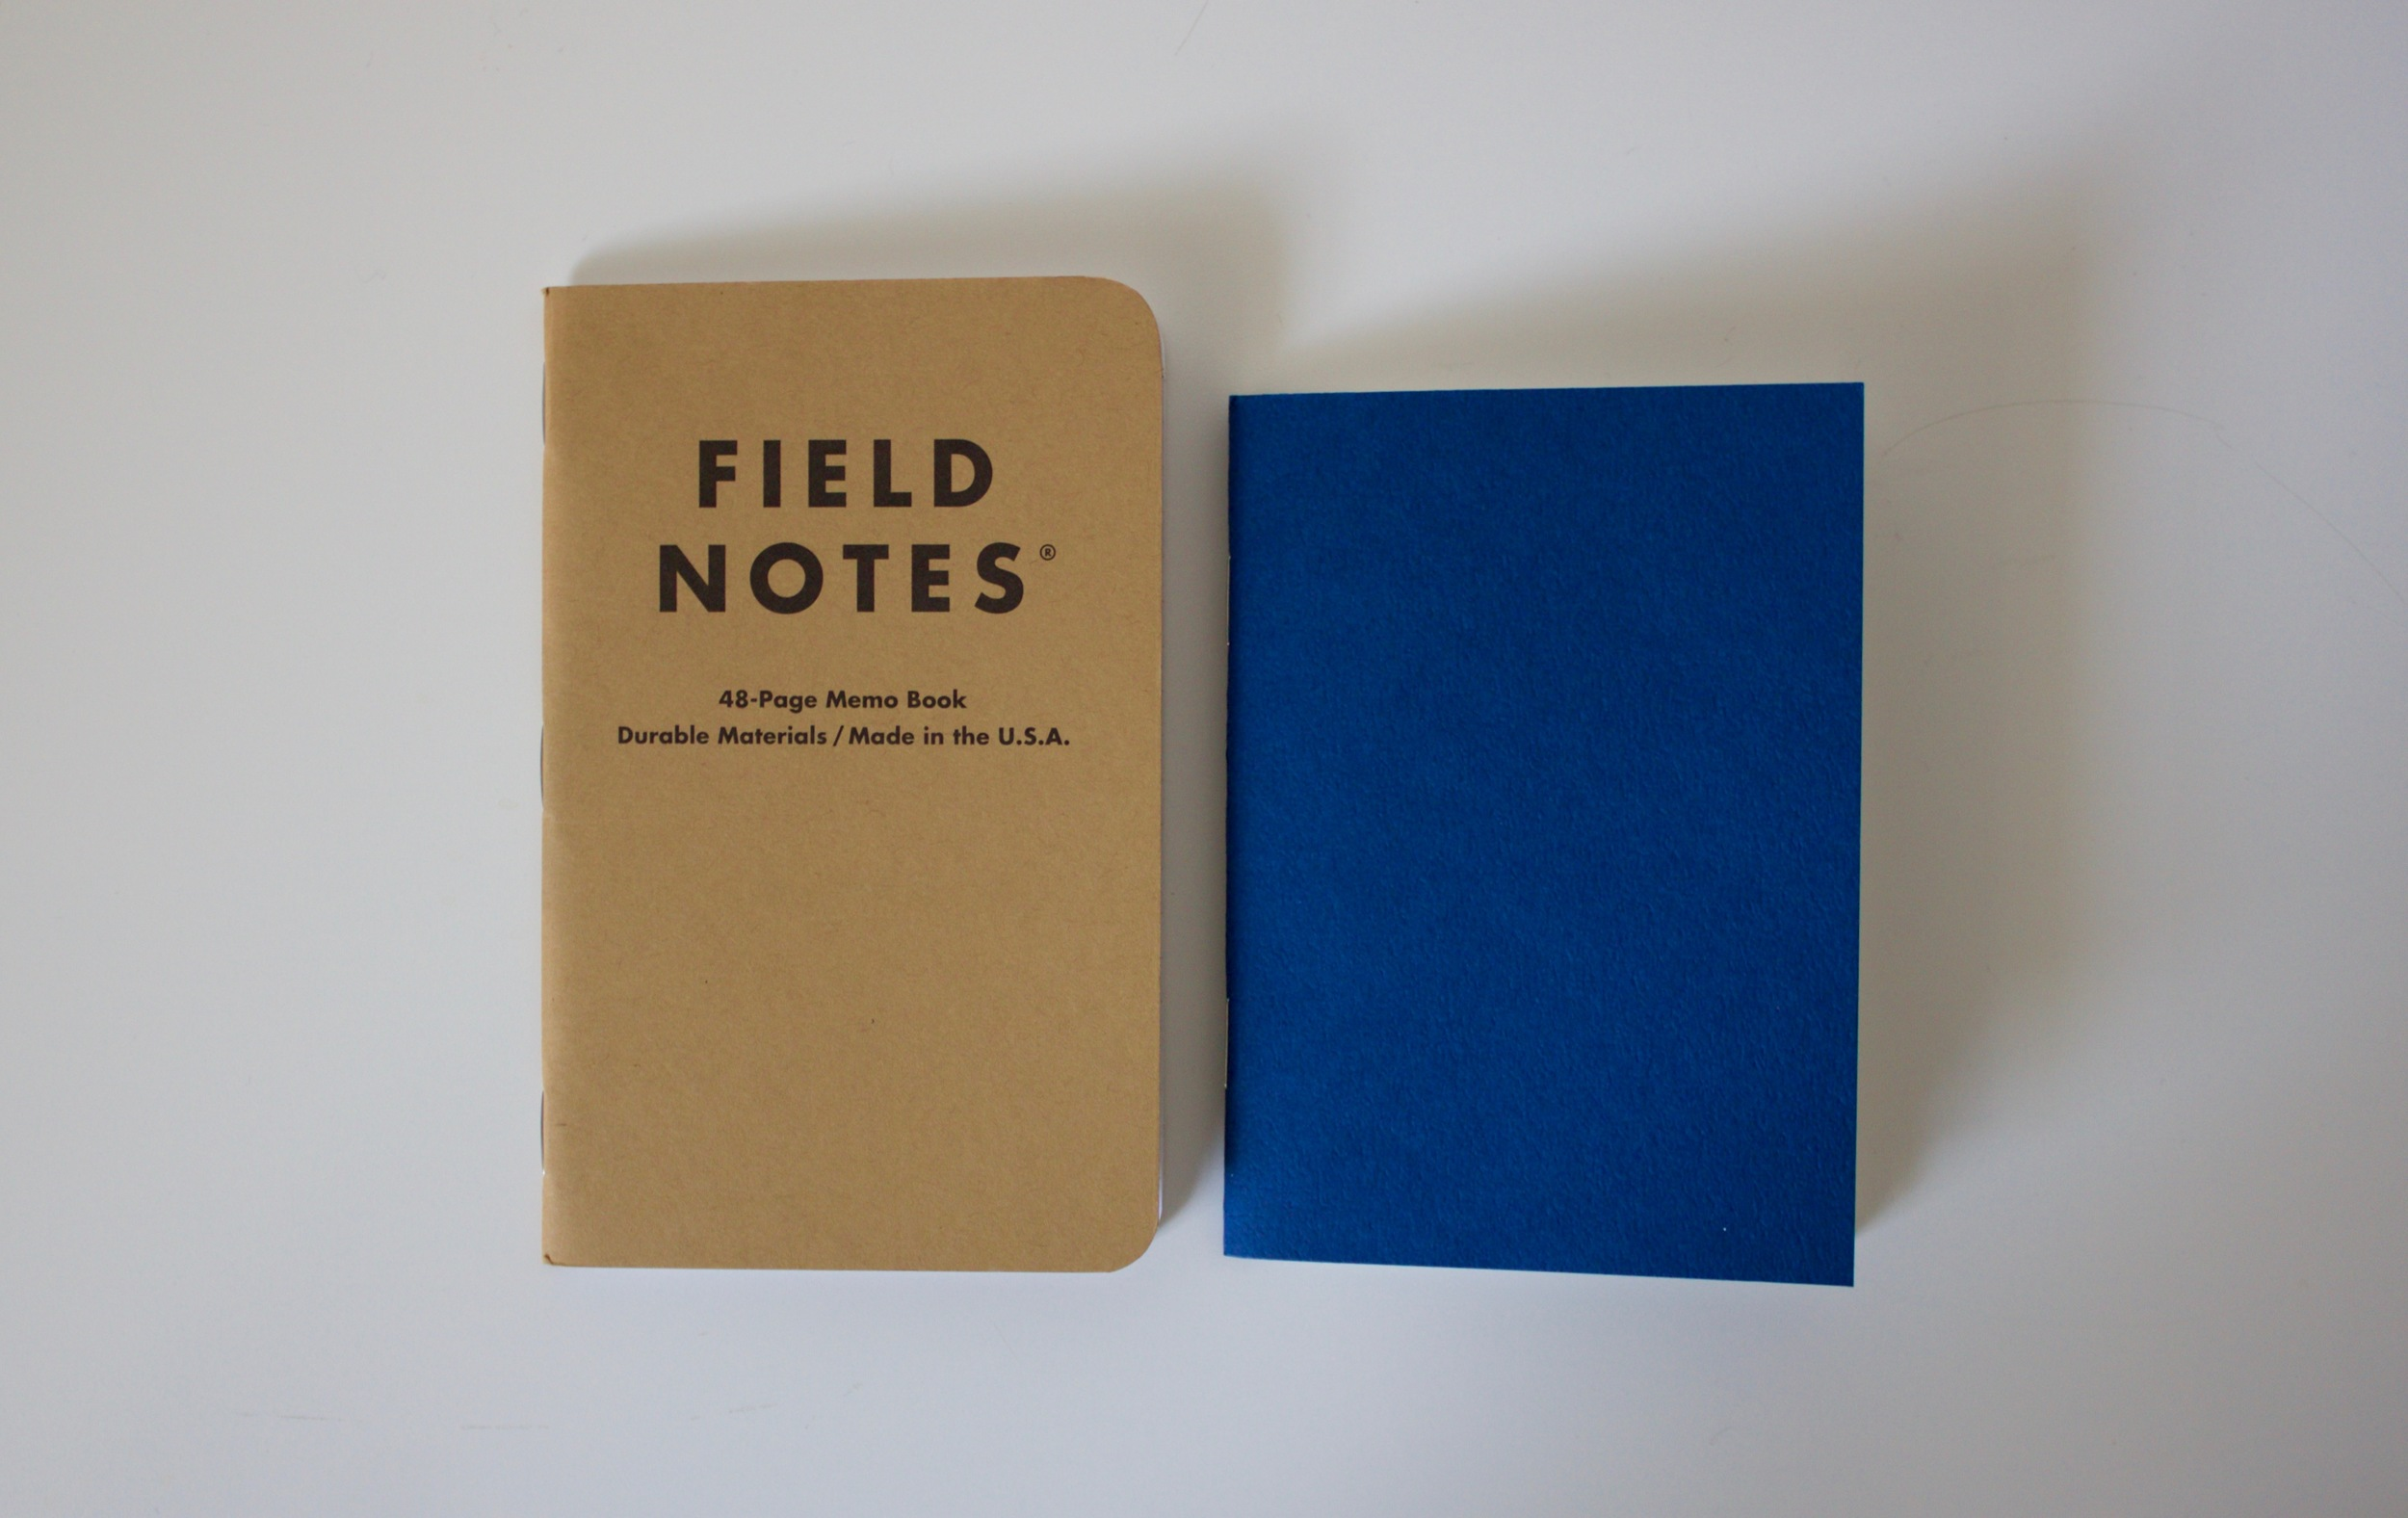 Field Notes memo book in comparison to the Midori Passport sized ruled refill